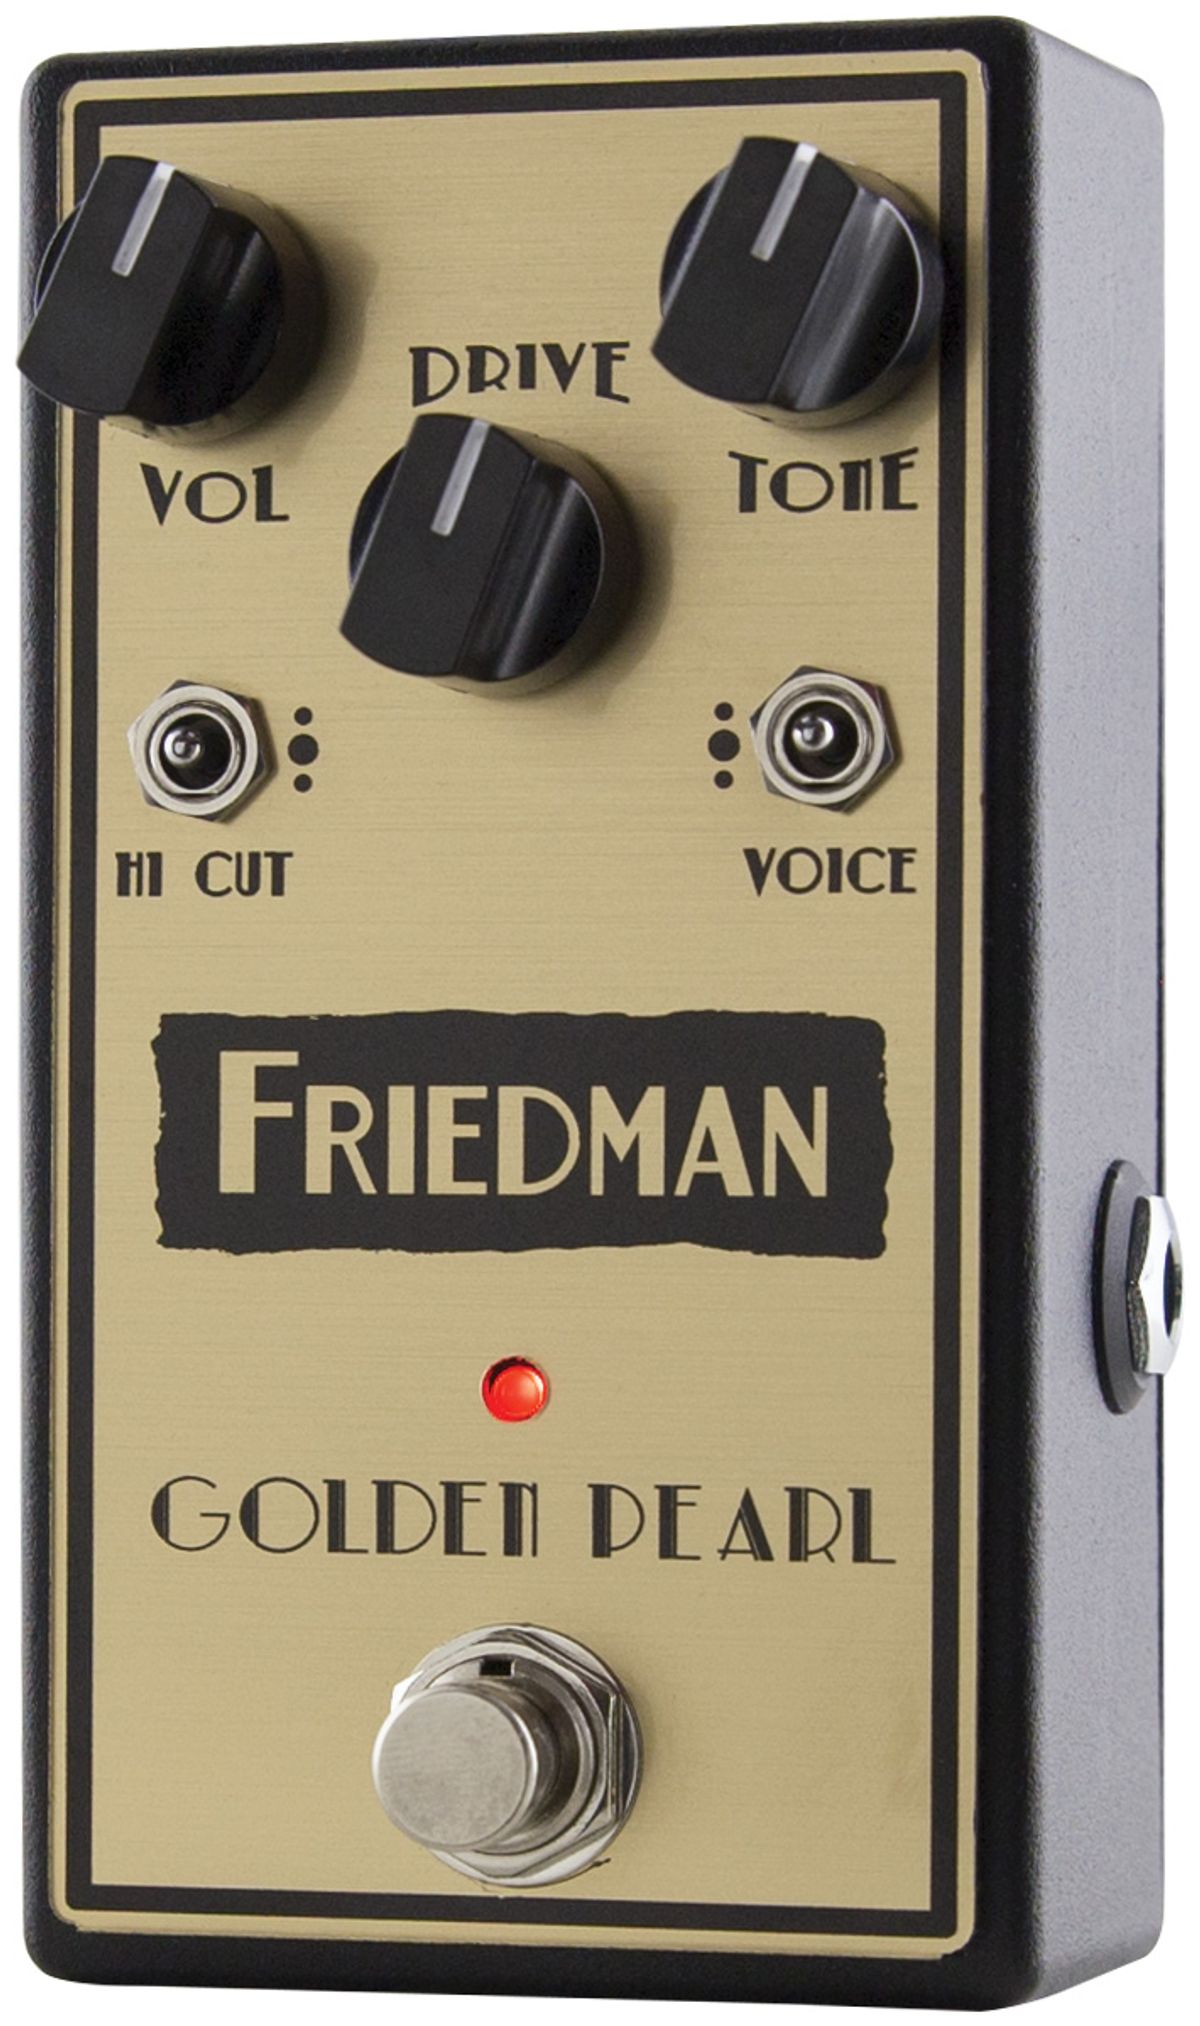 Quick Hit: Friedman Golden Pearl Review